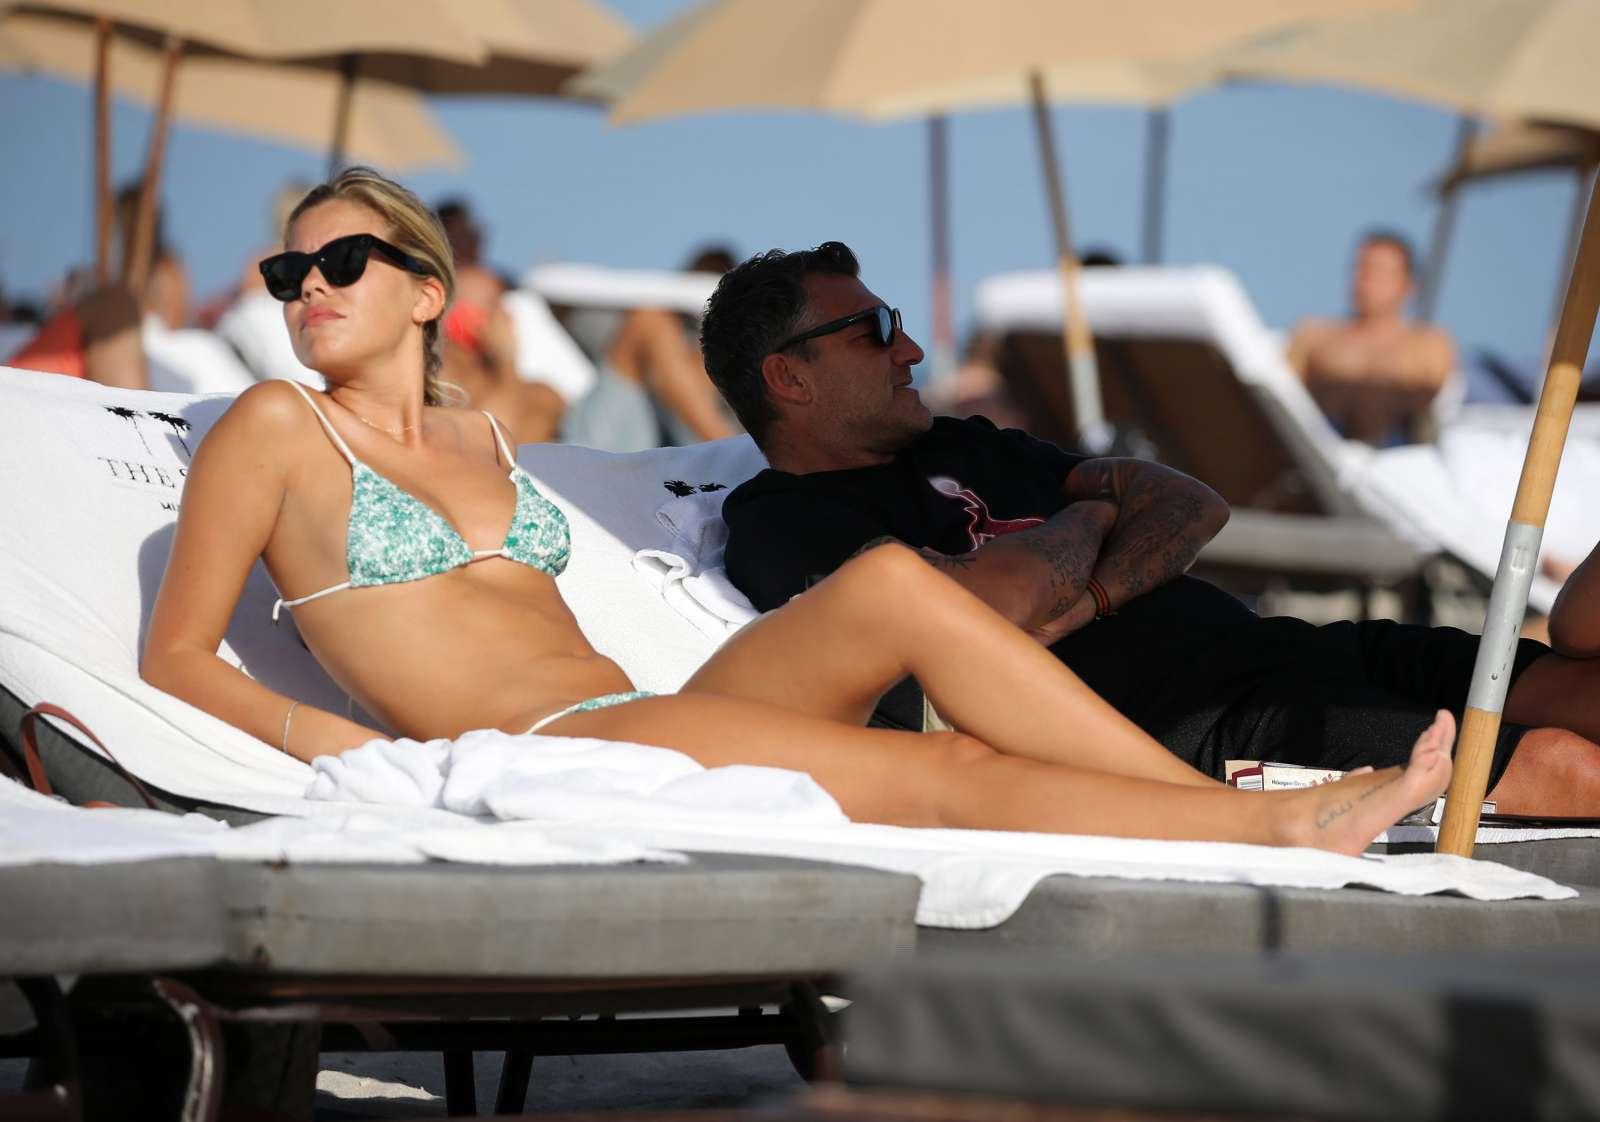 Constance Caracciolo 2017 : Constance Caracciolo in Bikini Sunbathing -07